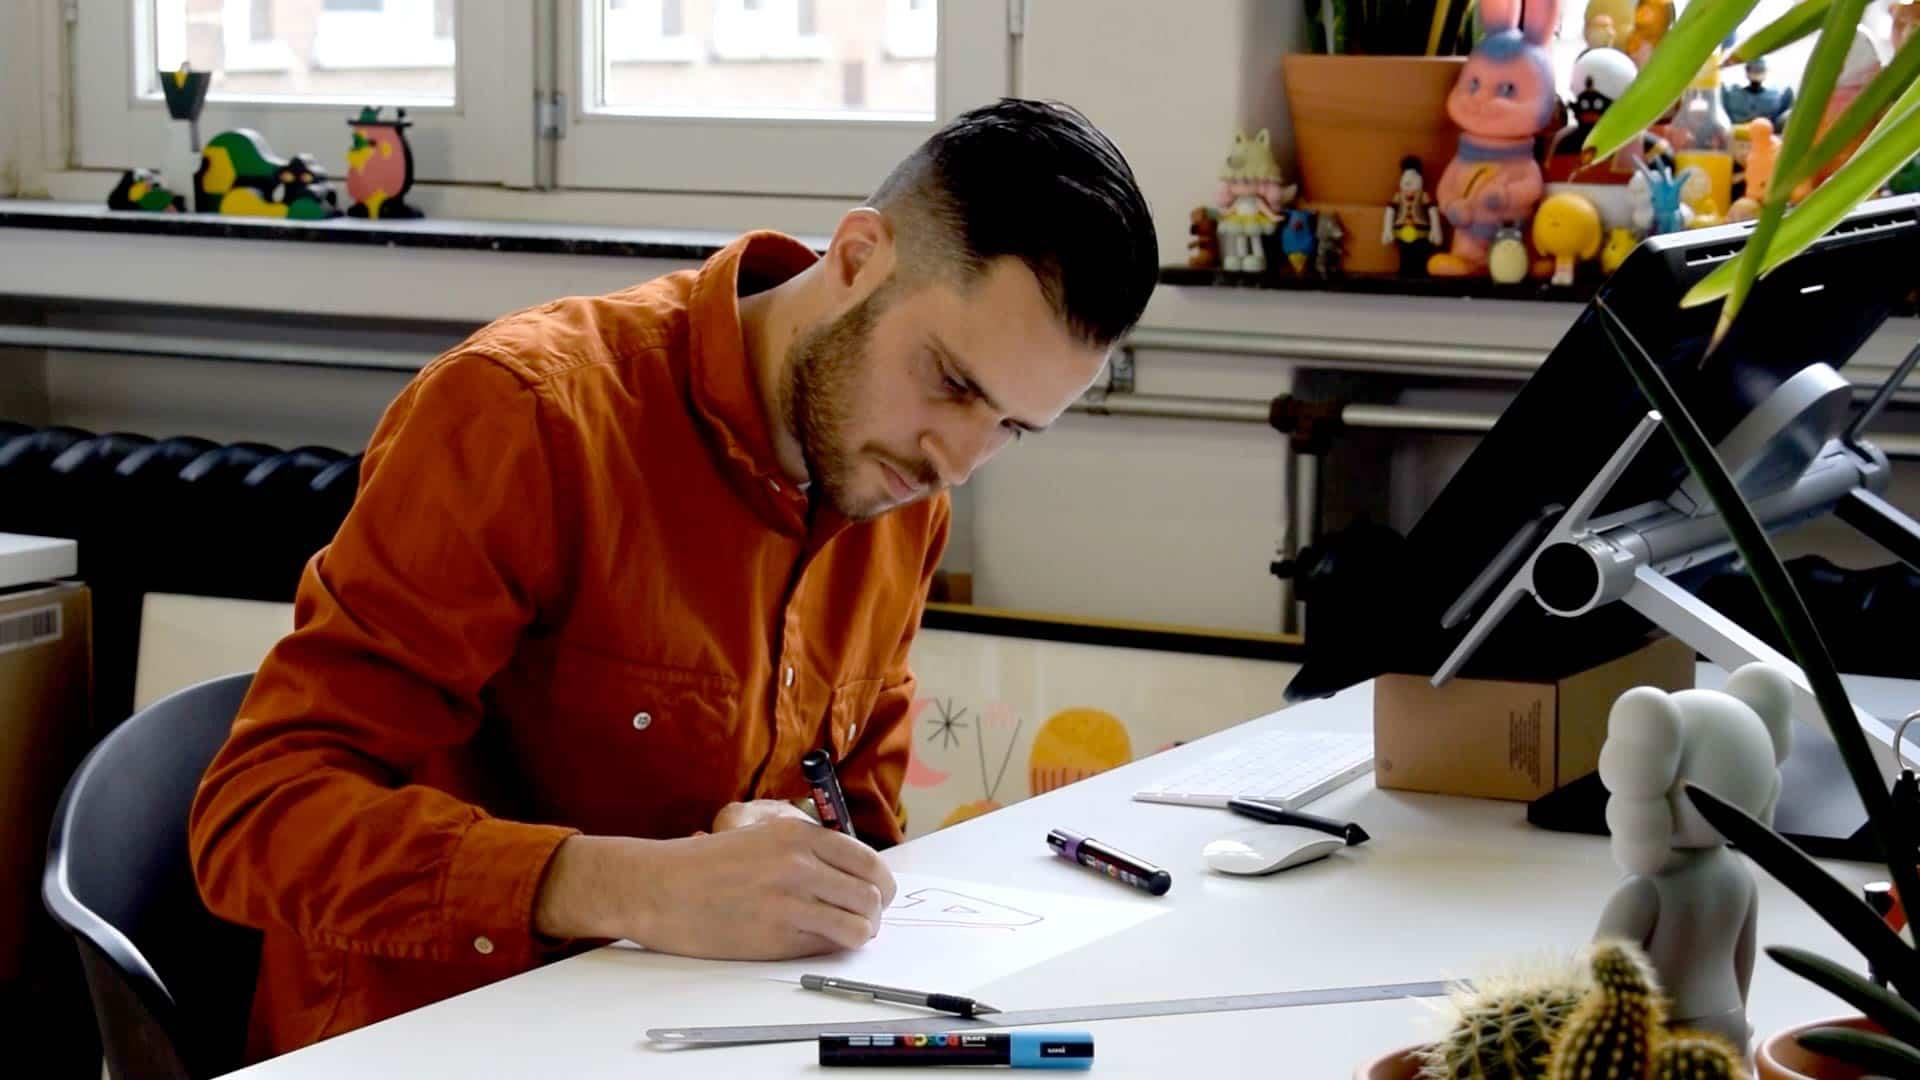 Hedof street artist